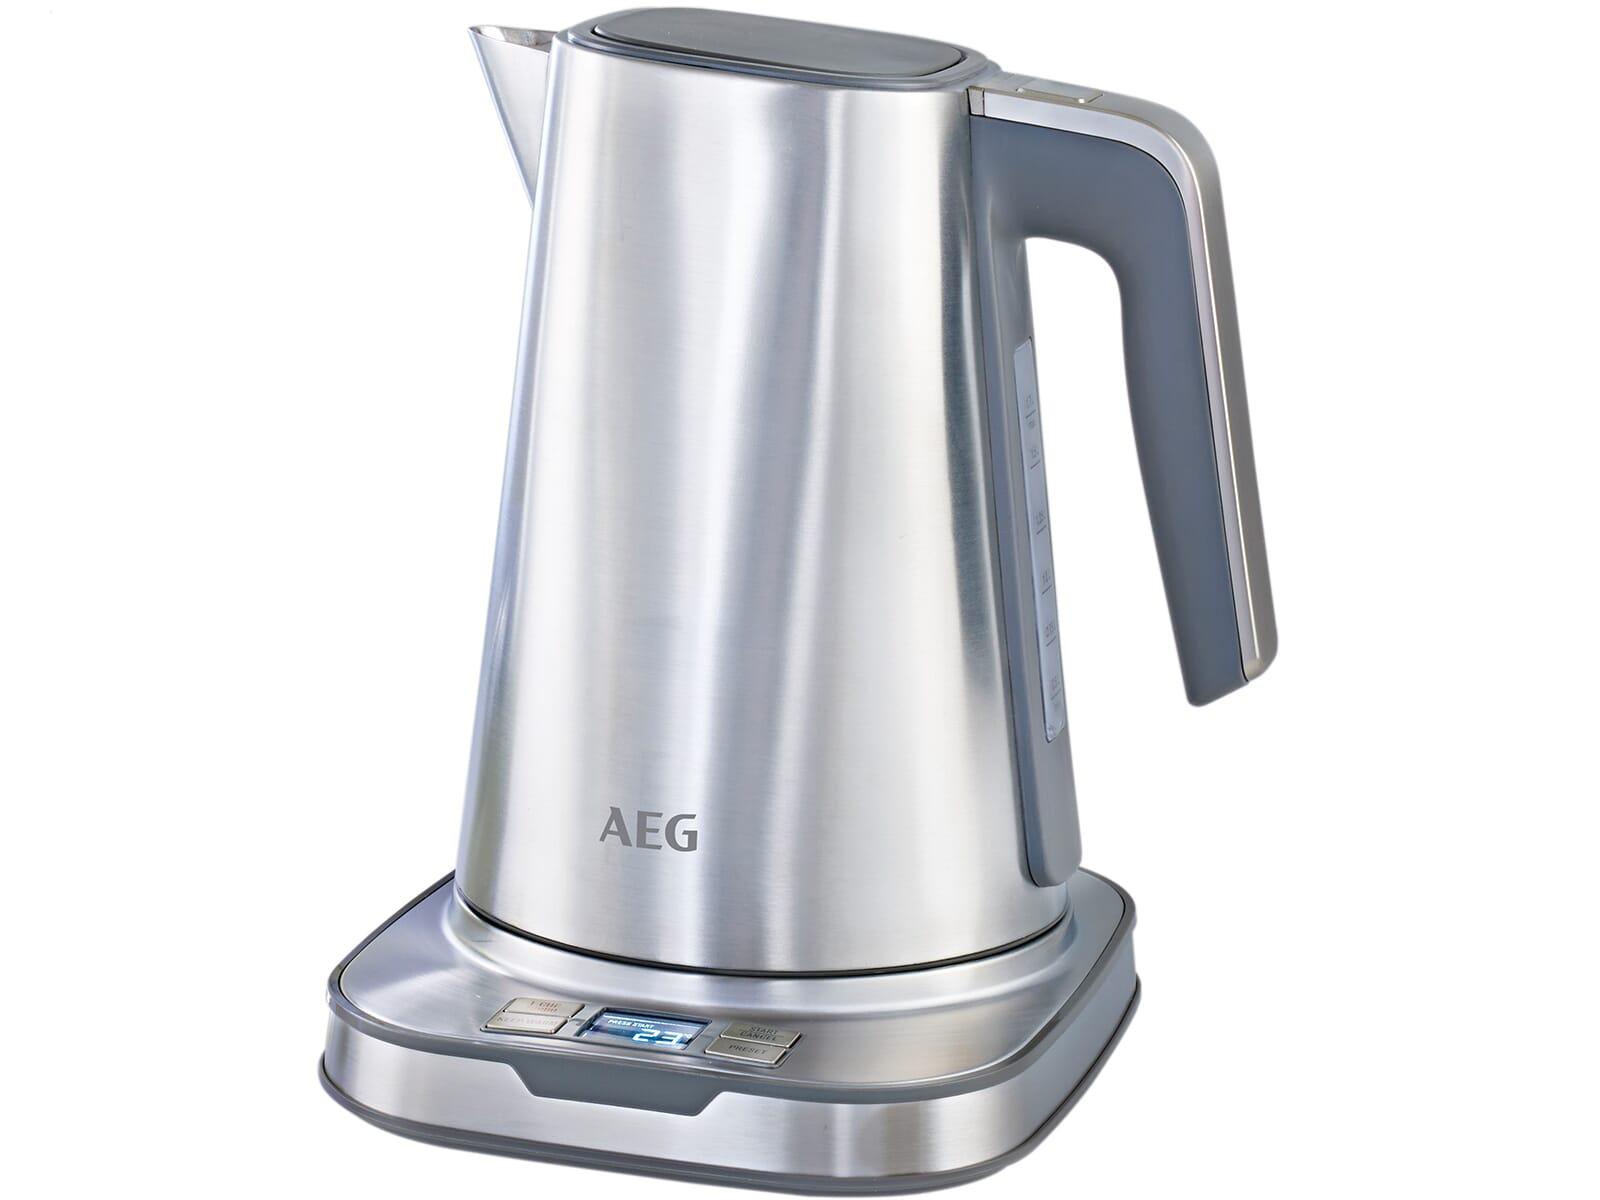 AEG EWA7800 Wasserkocher Edelstahl